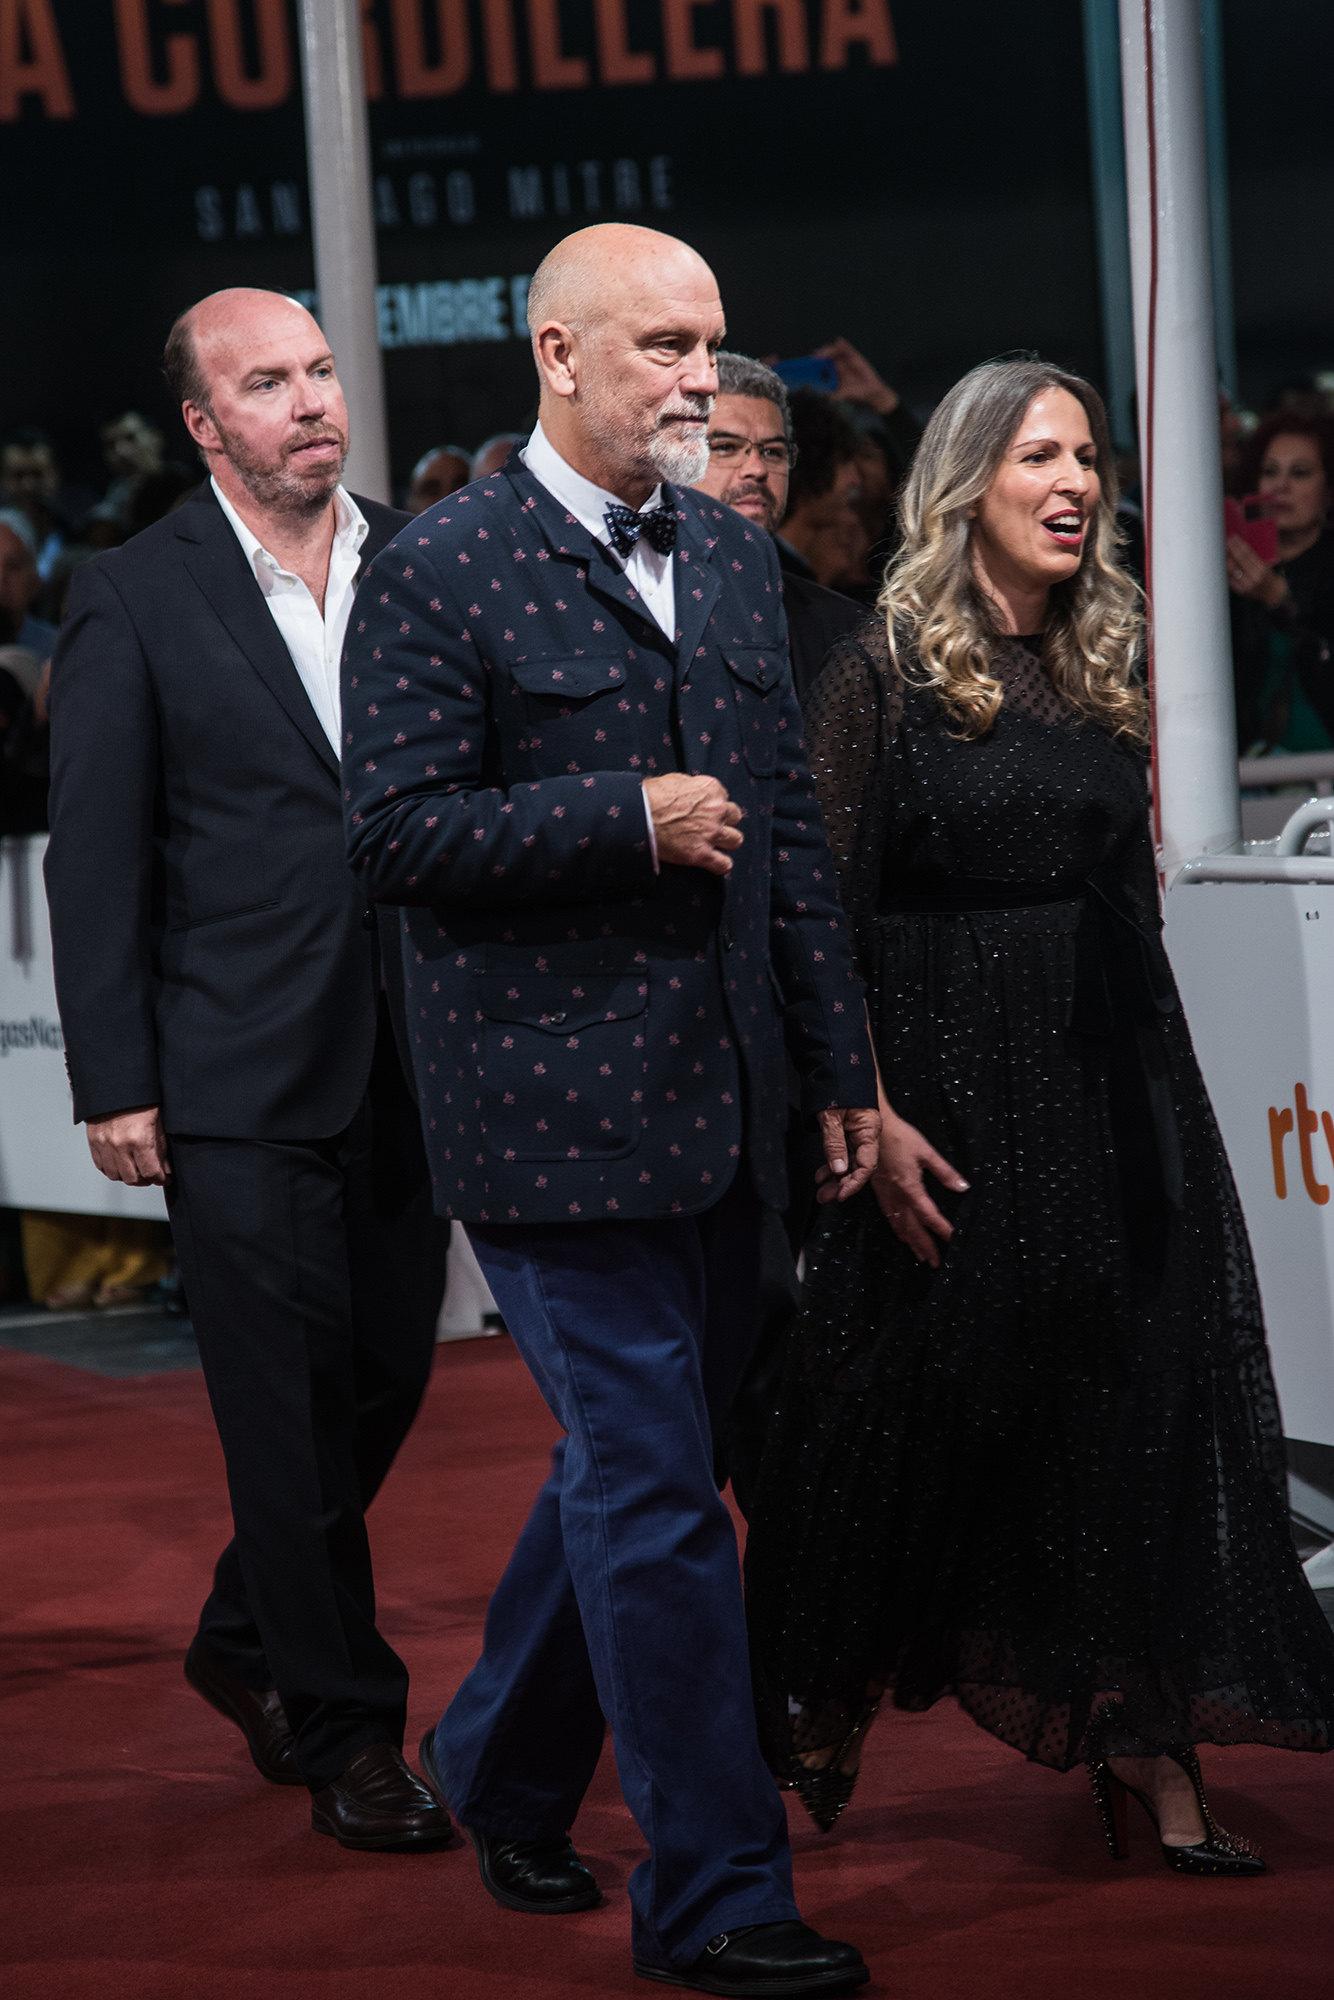 John Malkovich attends the red carpet of the closure gala during 65th San Sebastian Film Festival at Kursaal on September 30, 2017 in San Sebastian, Spain. (Photo by )